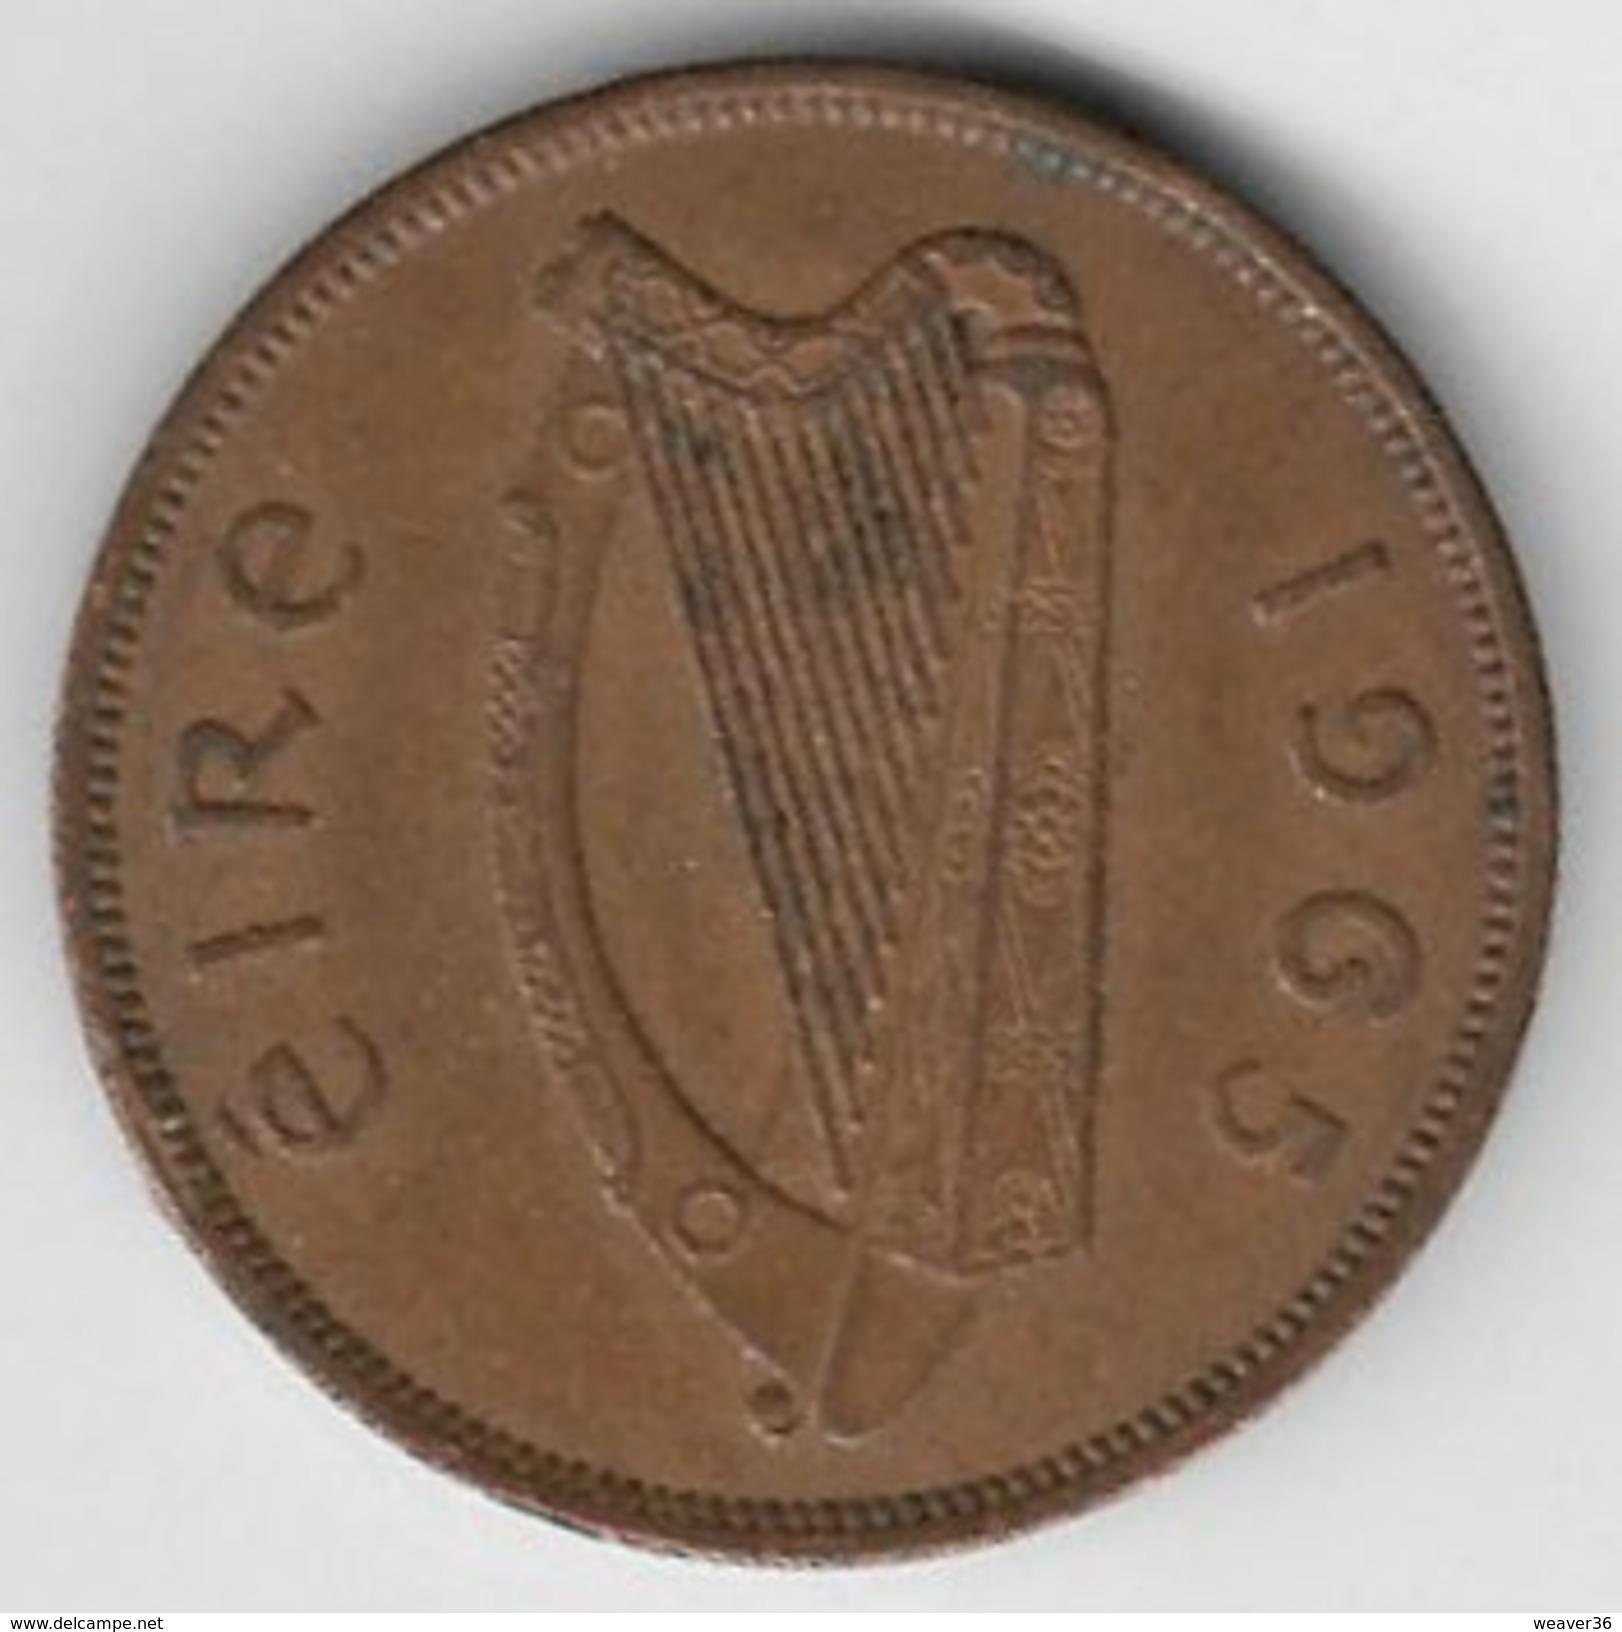 Ireland 1965 1d [C114/1D] - Ireland